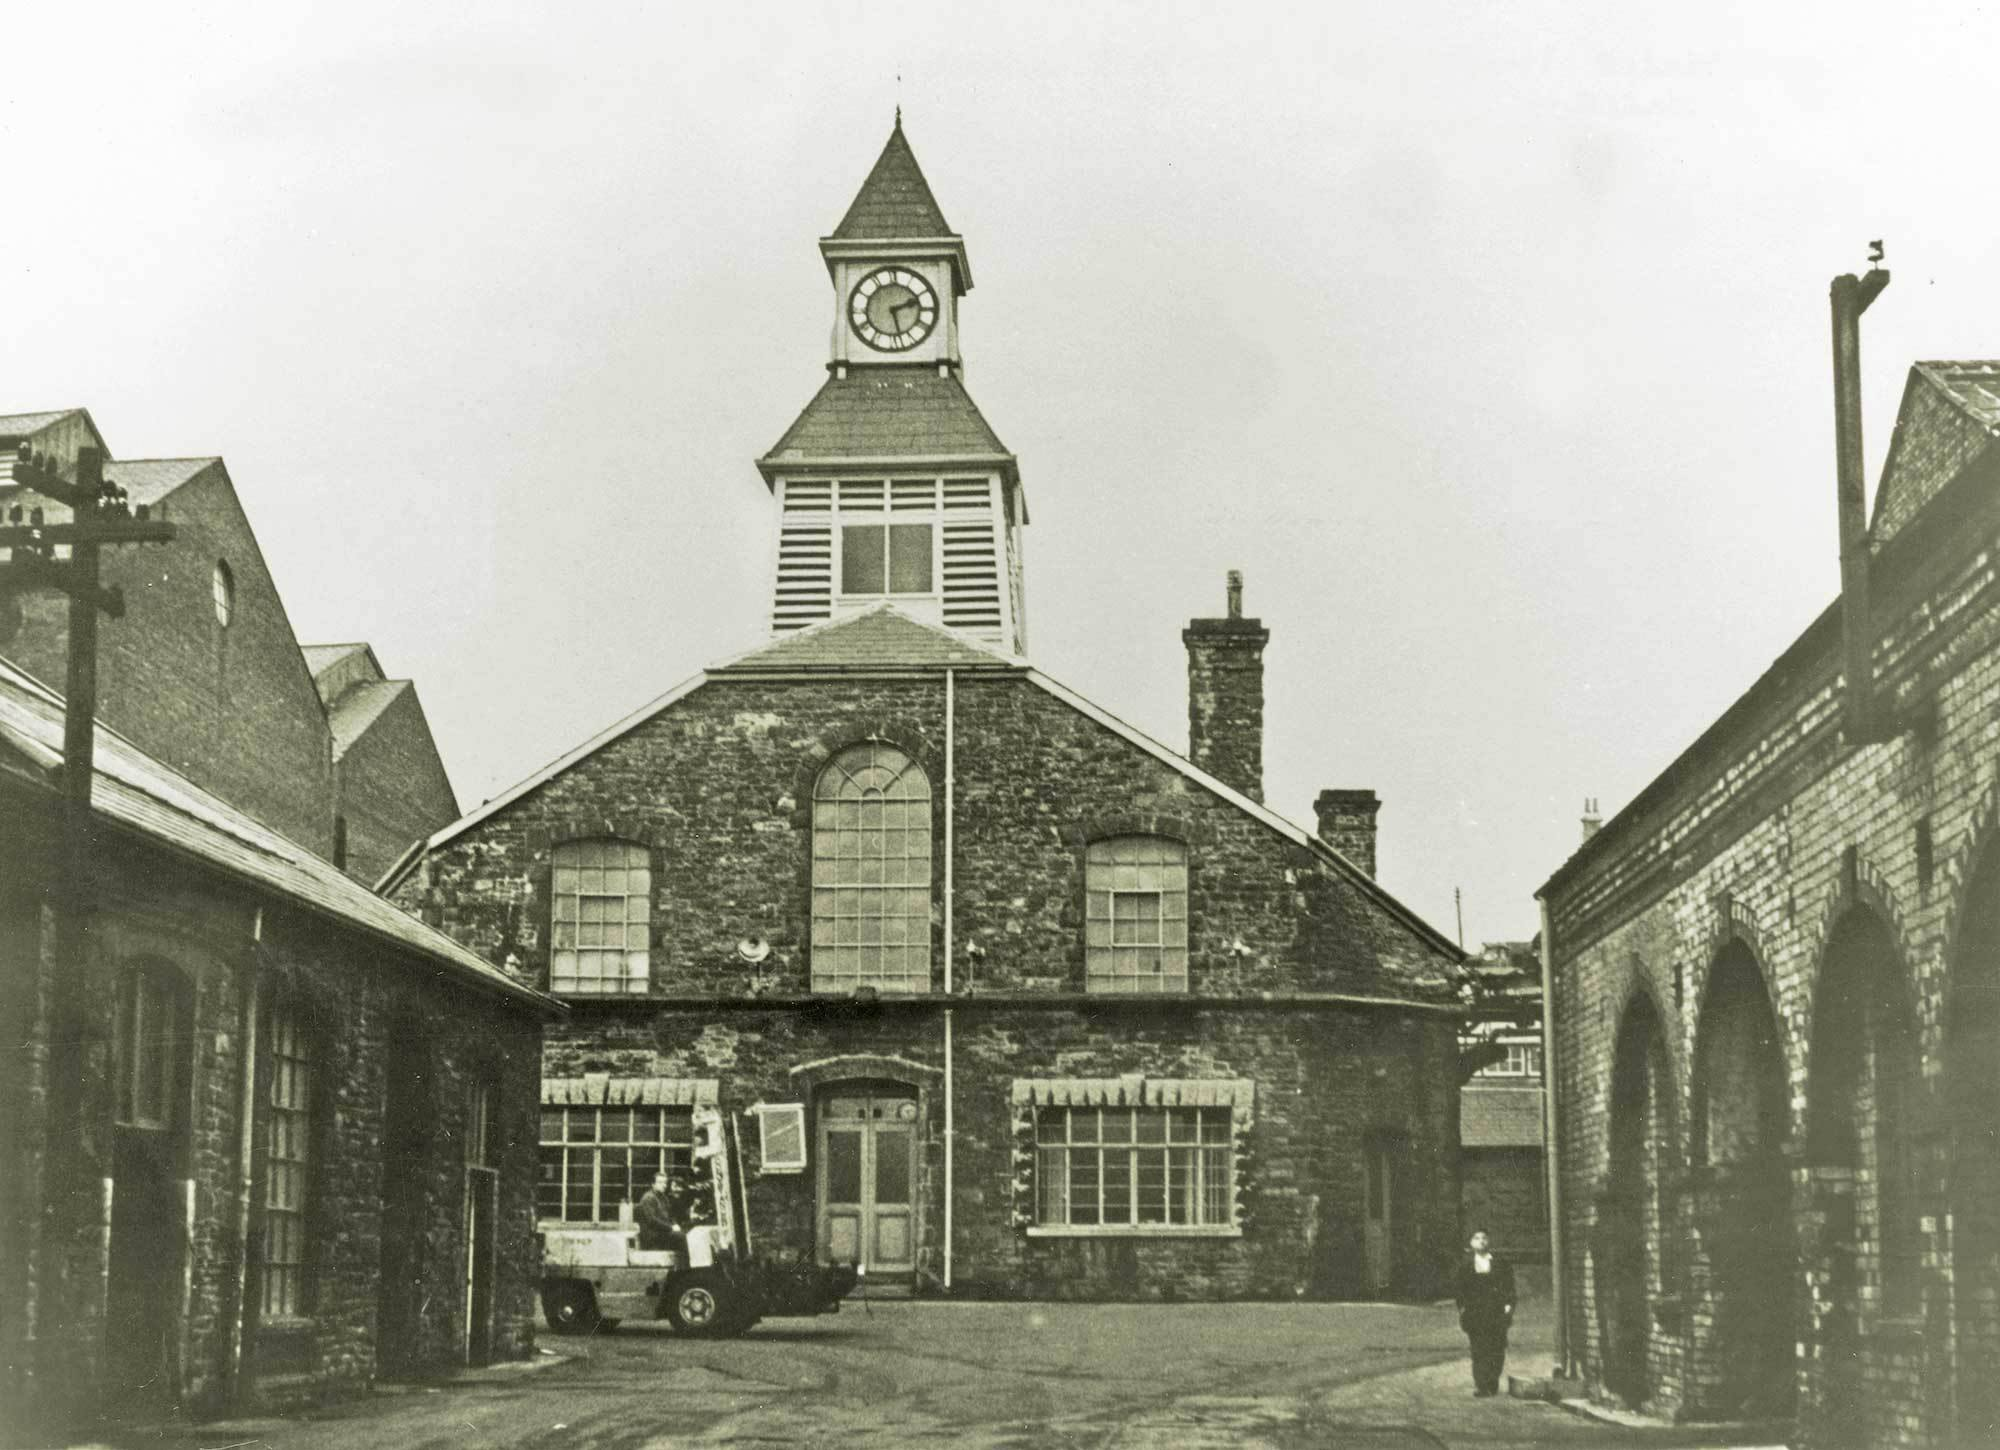 Hafod-Morfa Copperworks, Swansea